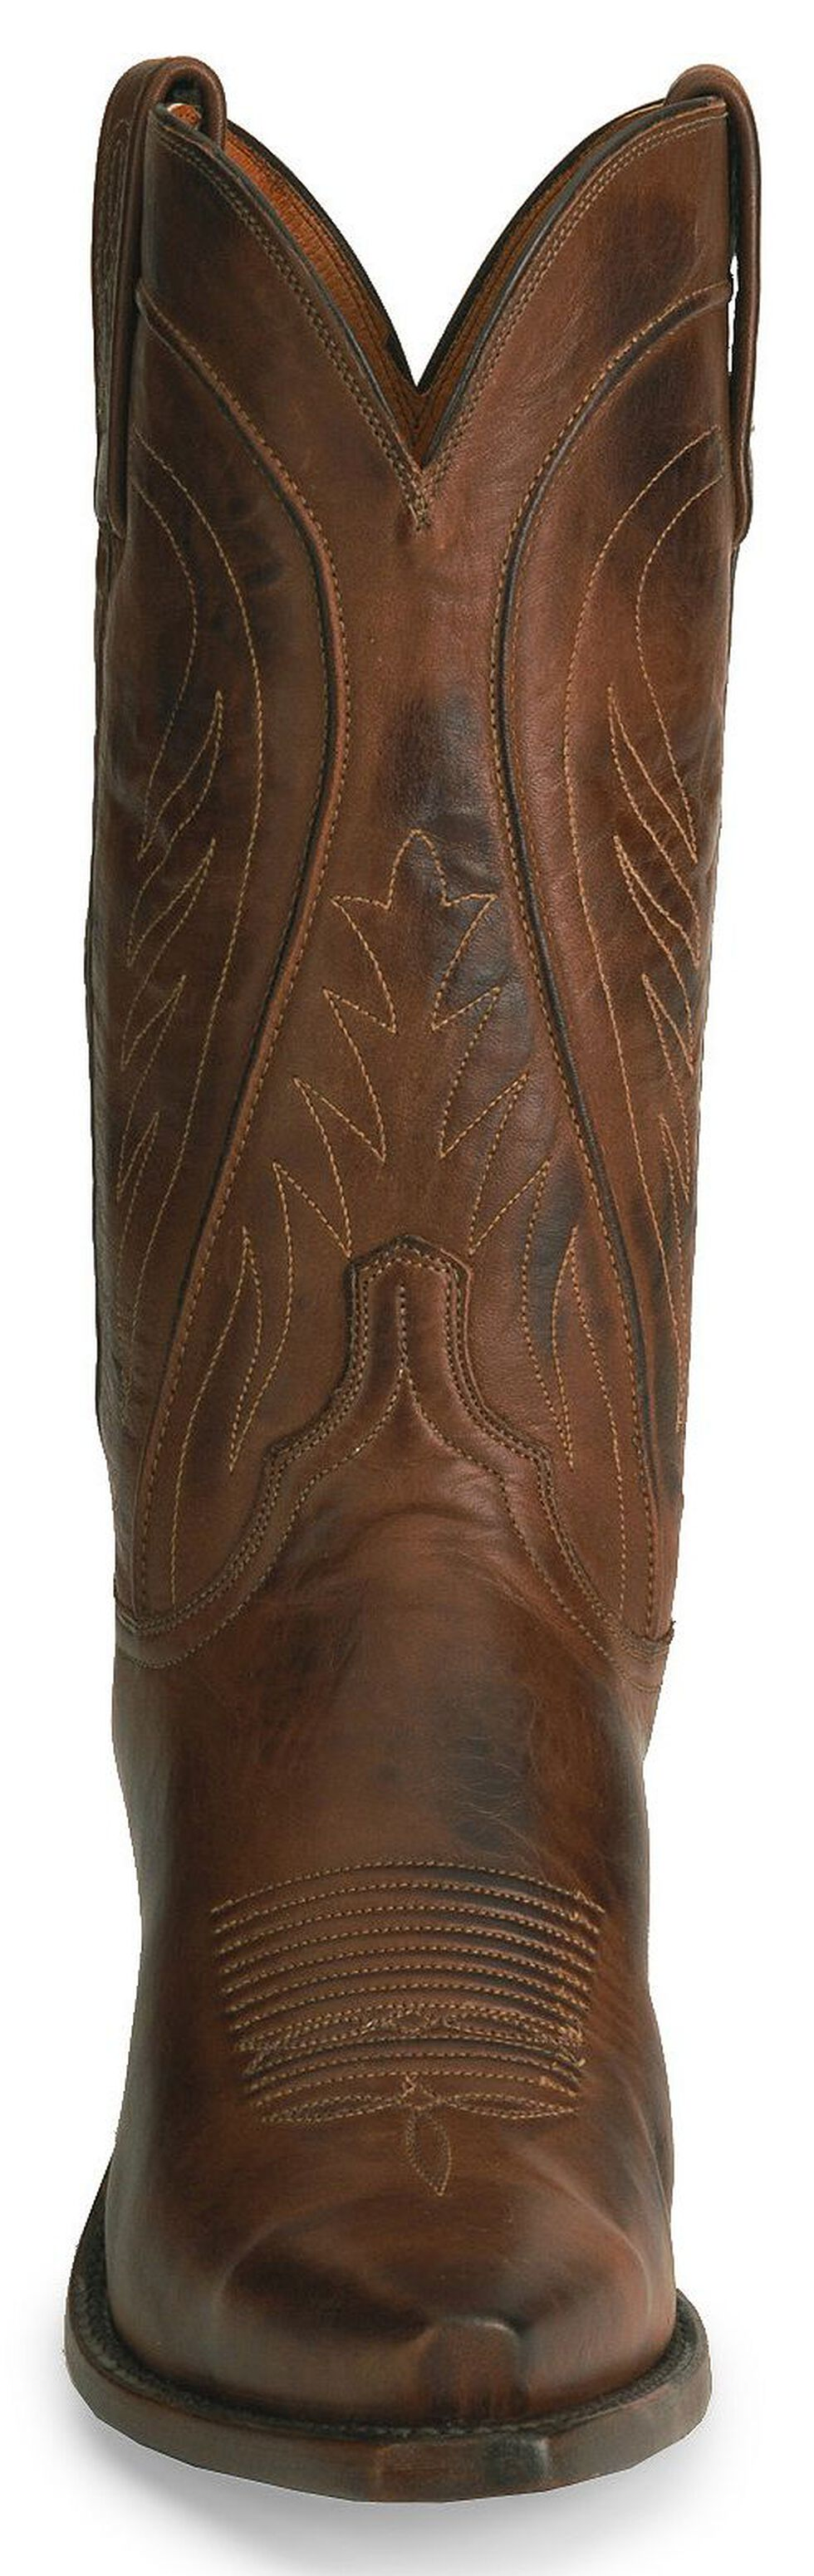 Lucchese Handmade 1883 Tan Ranch Hand Cowboy Boots, Tan, hi-res